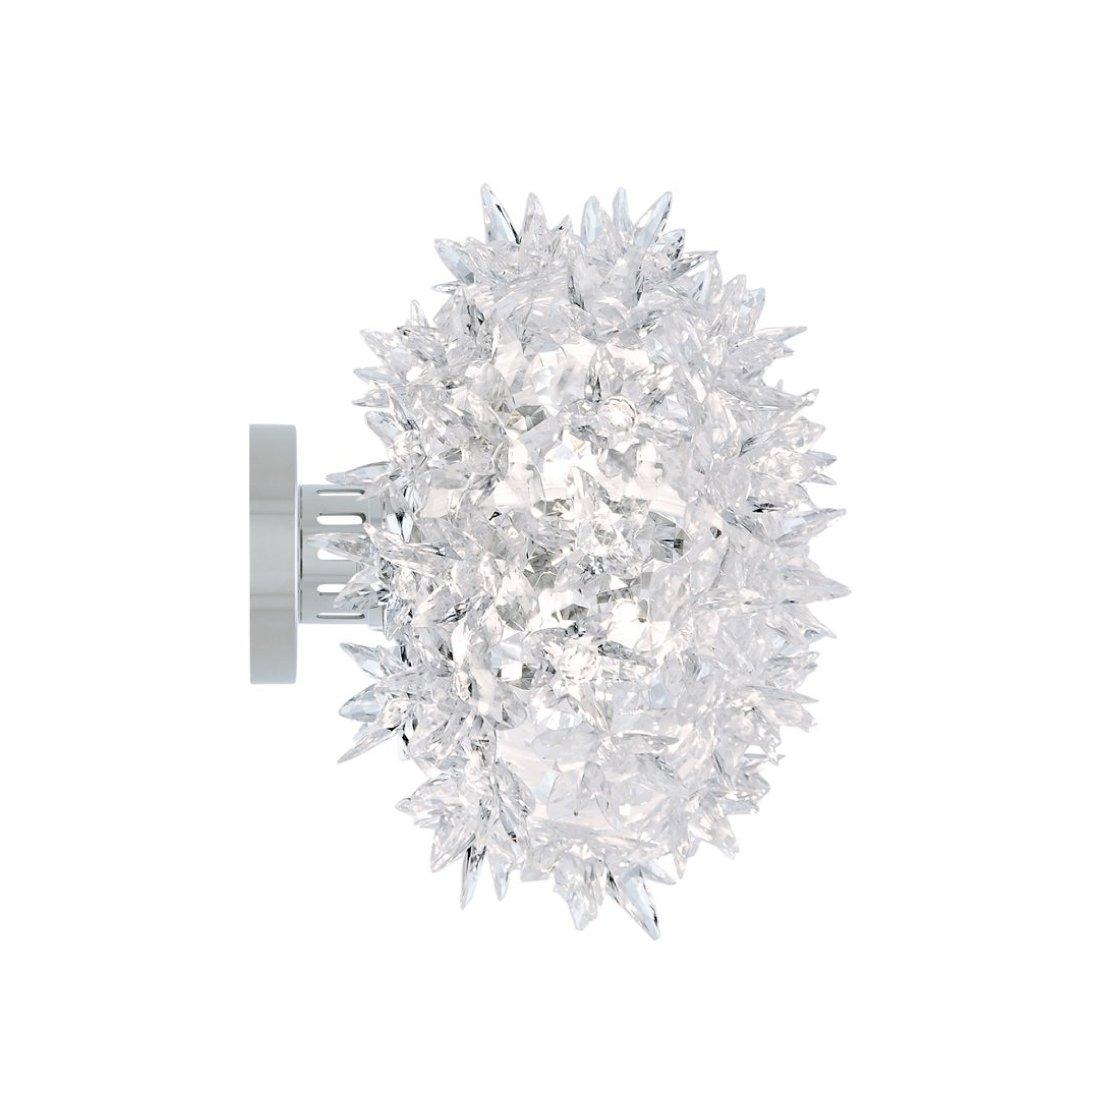 Kartell Bloom CW2 Wandlamp Kristal